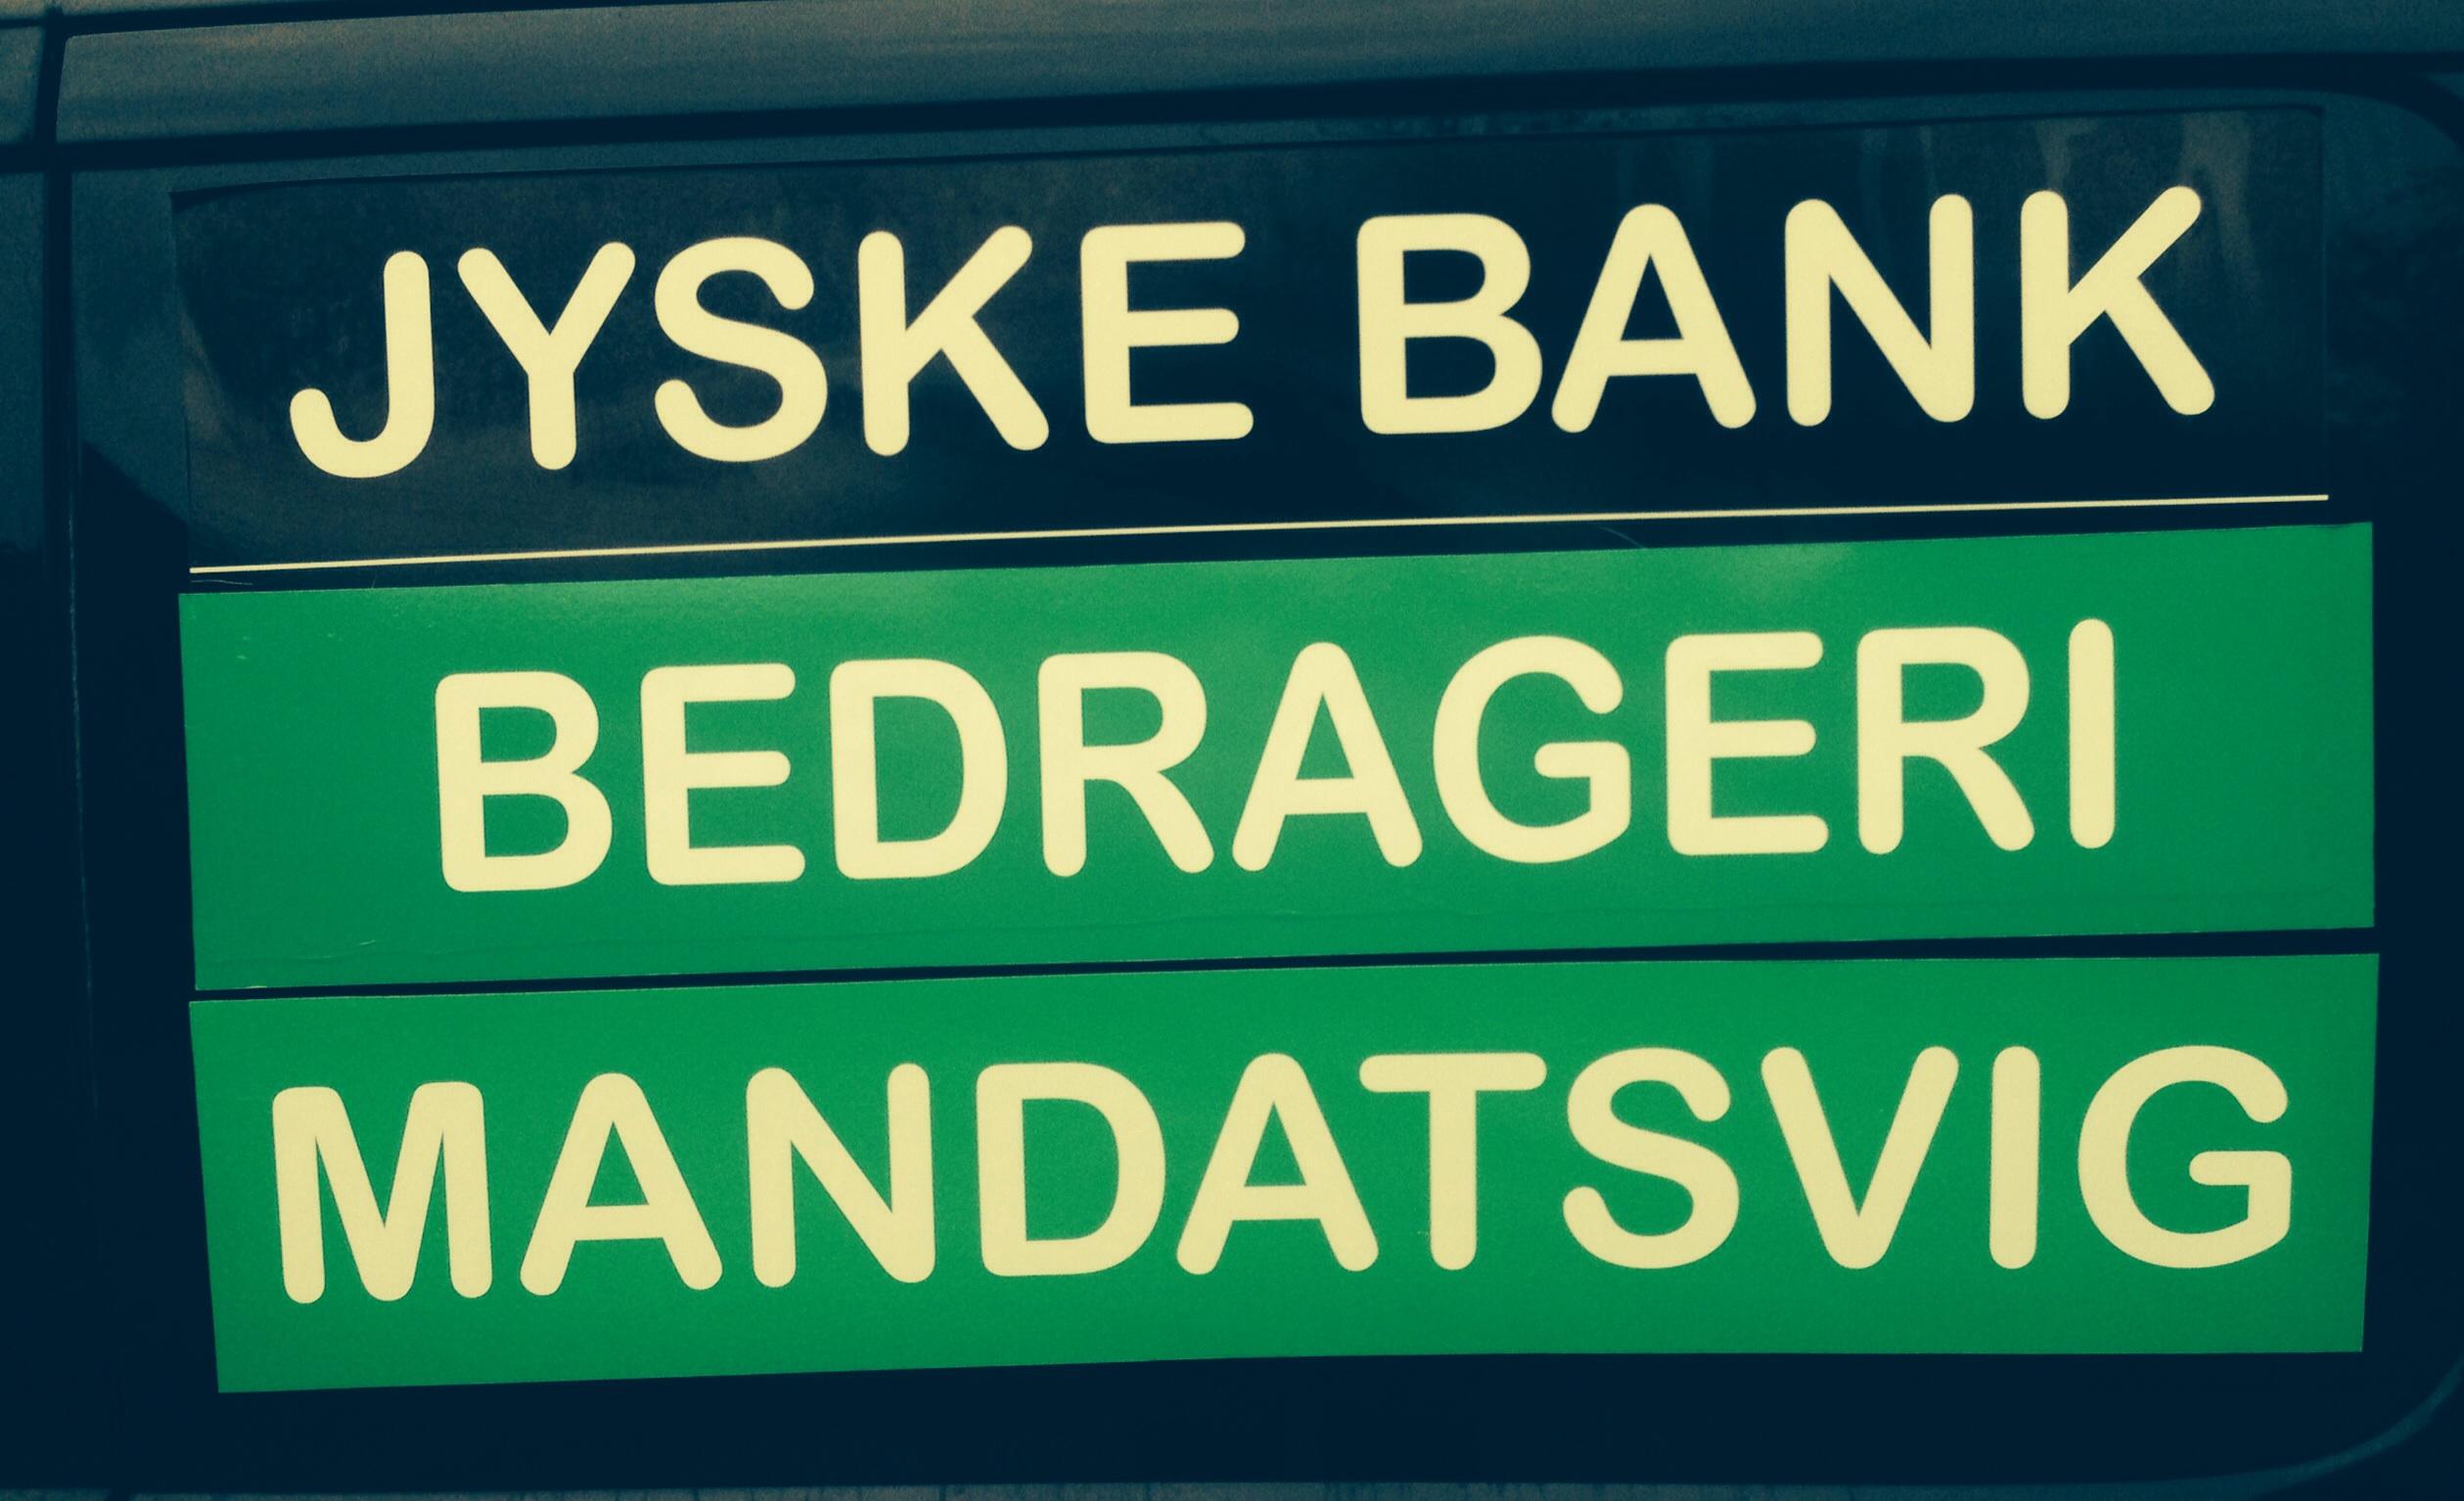 ADVARSEL MOD STOR DANSK BANK. Når man som kunder i jyskebank åbenlyst bliver bedraget, og Jyske Banks direktion ved det. Men i ond tro lader jyske bank svindle deres kunder, ved hjælp af svig falsk. Hvad kan man så gøre når, jyske bank og deres løgnagtige advokater i Lund Elmer Sandager nægter at kommunikerer. Vi kan kun ADVARER DIG I MOD AT STOLE PÅ JYSKE BANK. DA JYSKE BANK BEVIST LYVER OVERFOR OS KUNDER. Jyske bank indbydes igen til dialog møde, for at gennemgå sagen mod jyske bank for svindlen. :-) I DANMARK STØTTER STATEN BANKERNE DER SOM TAK BEDRAGER DERES KUNDER VED SVIG OG FALSK :-) :-) JYSKE BANK OPFORDRES IGEN TIL PÅ JYSKE BANK TV, AT DULERER ER JYSKE BANK BEDRAGERISK ELLER HÆDERLIG Tør CEO Anders Dam tage opfordring om en offenlig debat Således vi kan gå vores sag om svindel i jyske bank mod familien igennem. :-) Det er handler om bedrageri svindel svig falsk mandatsvig dokumentfalsk manipulation udnyttelse mm. kort sagt Det handler om jyske bank :-) Familien som jyske bank her bedraget i en periode på 9 år. Heraf har jyske bank været bevist om at svindlen var opdaget senest i maj 2016 men CEO Anders Dam valgte at fortsætte bedrageri, og nægte familien dialog. :-) :-) Er lige oplyst af en som ringede, at jyske bank har modtaget 4 bankpakker. Og at flere af de danske banker er statstøttet. :-) :-) Måske derfor lader den Danske Stat Jyske bank overtræde love og regler på stribe. Det er jo åbenbart de danske banker det styre staten, så national banken ingen indflydelse har på dansk økonomi. :-) Hvem vil tage sagen op om de DANSKE BANKER DER SVINDLER. :-) :-) :-) Her er lidt billeder på div. Sprog Hvad ville du gøre når du opdager JYSKE BANK laver bedrageri Og banken nægter at svare dig :-) Шта бисте урадили када открију ЈИСКЕ БАНК прави превару И банка одбија да вам одговори :-) Financial help for lawyer search In the case against Danish bank jyske bank for fraud. :-) Indsæt dit bidrag her. Insert your contribution here Reg. 5479 konto nr. 0004563376 IBAN-ko